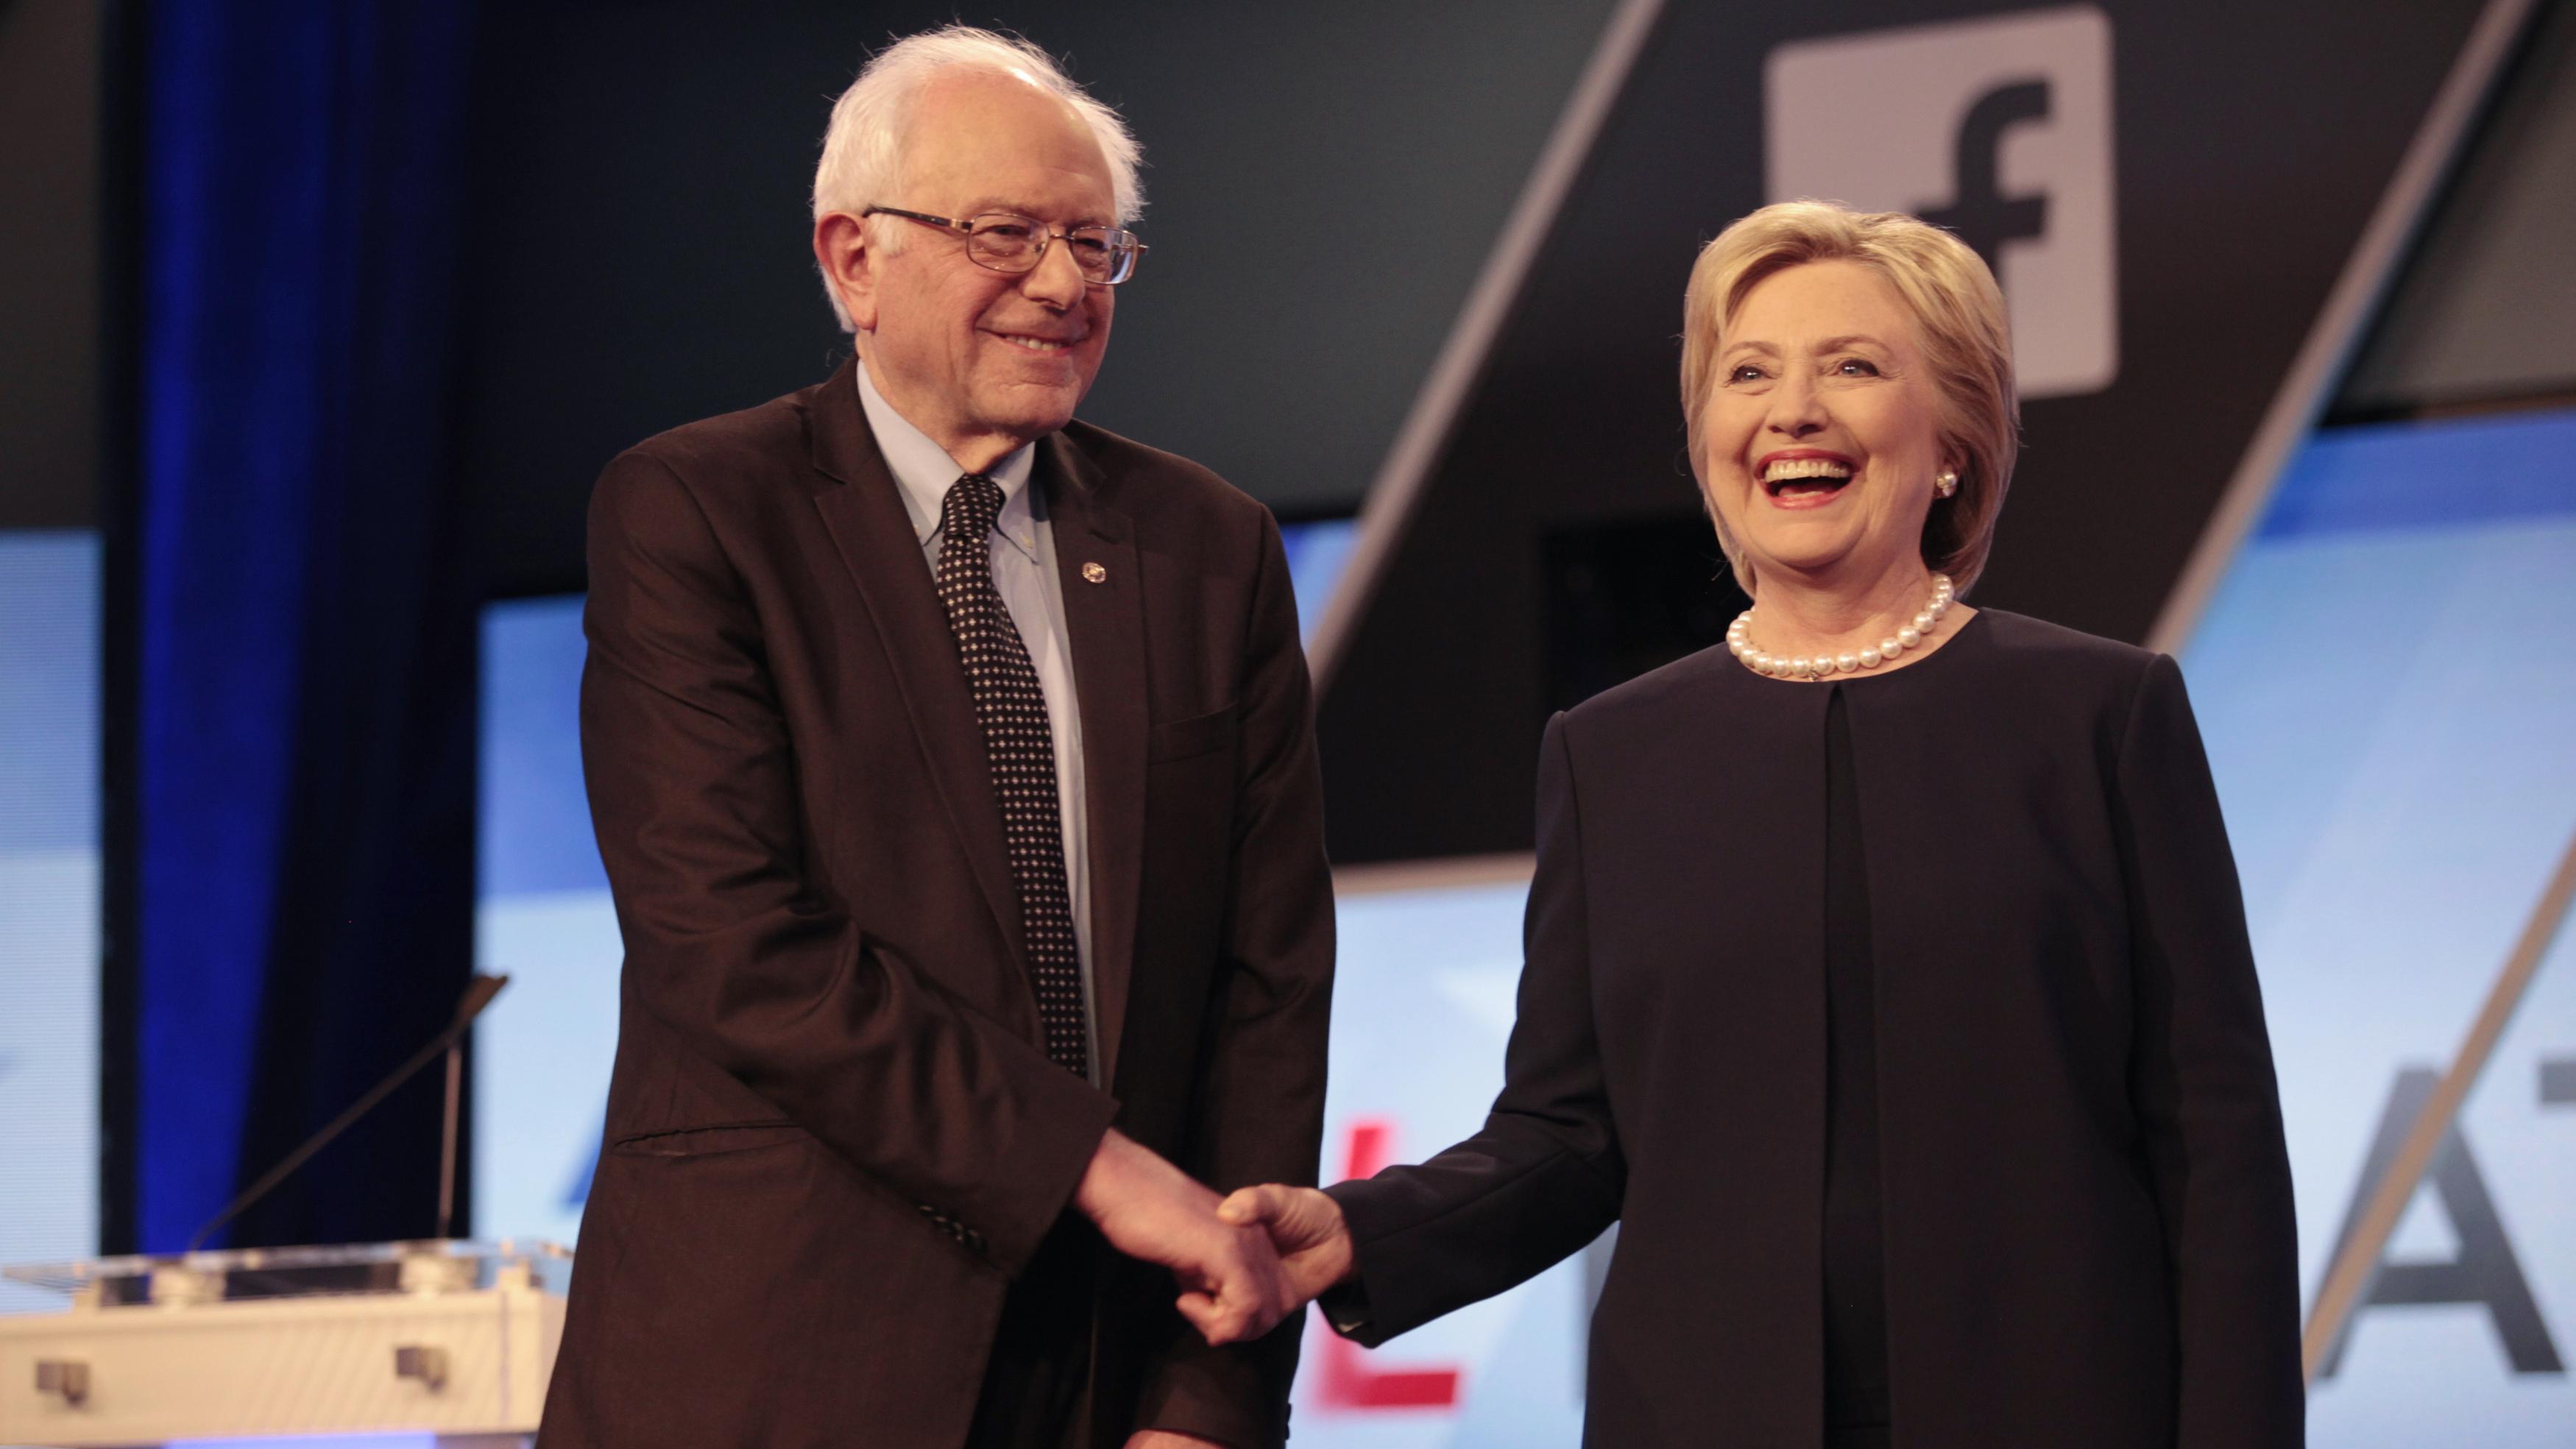 Clinton Sanders edit